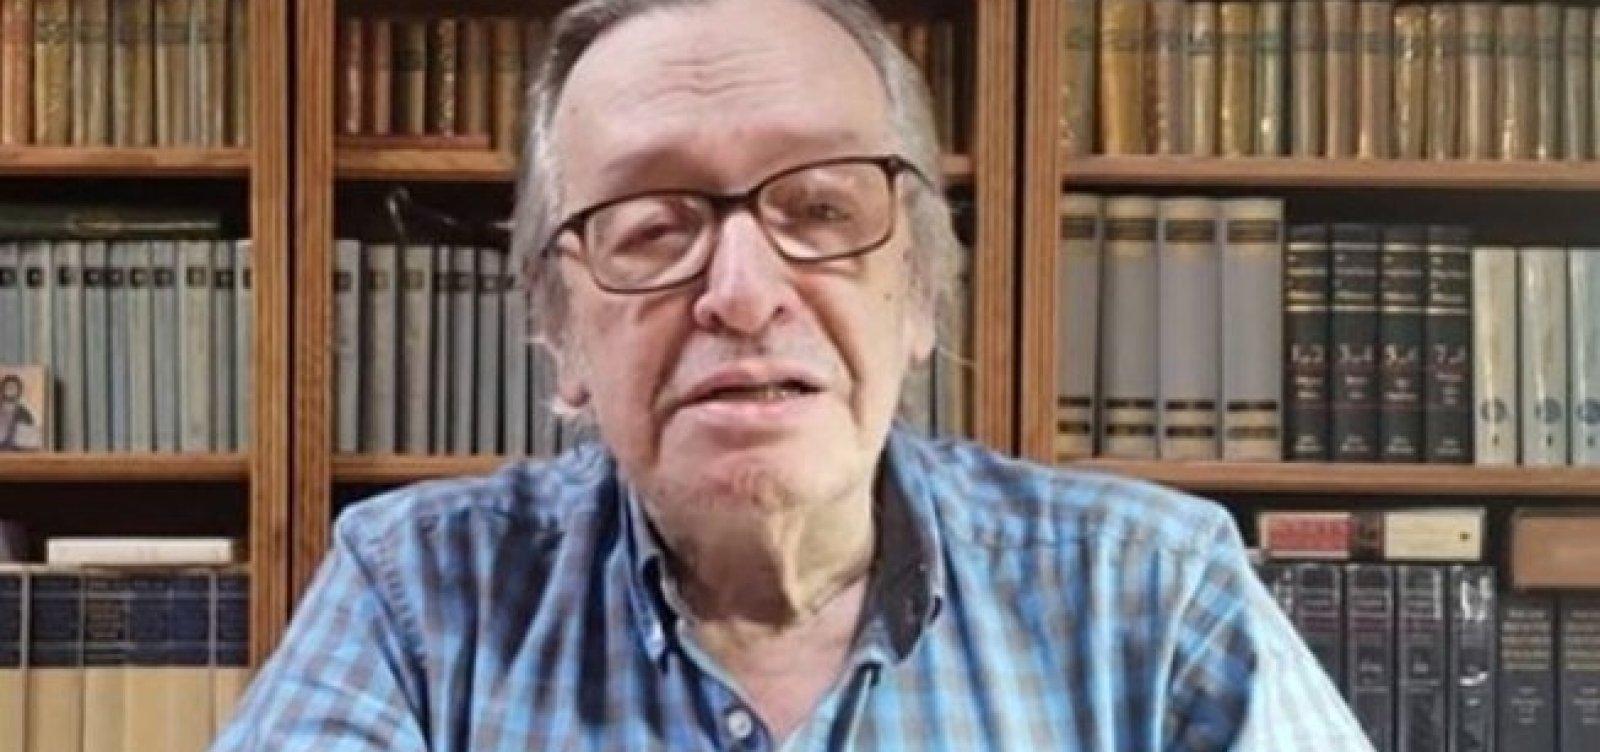 [Olavo critica Vélez após Bolsonaro sinalizar demissão do ministro]